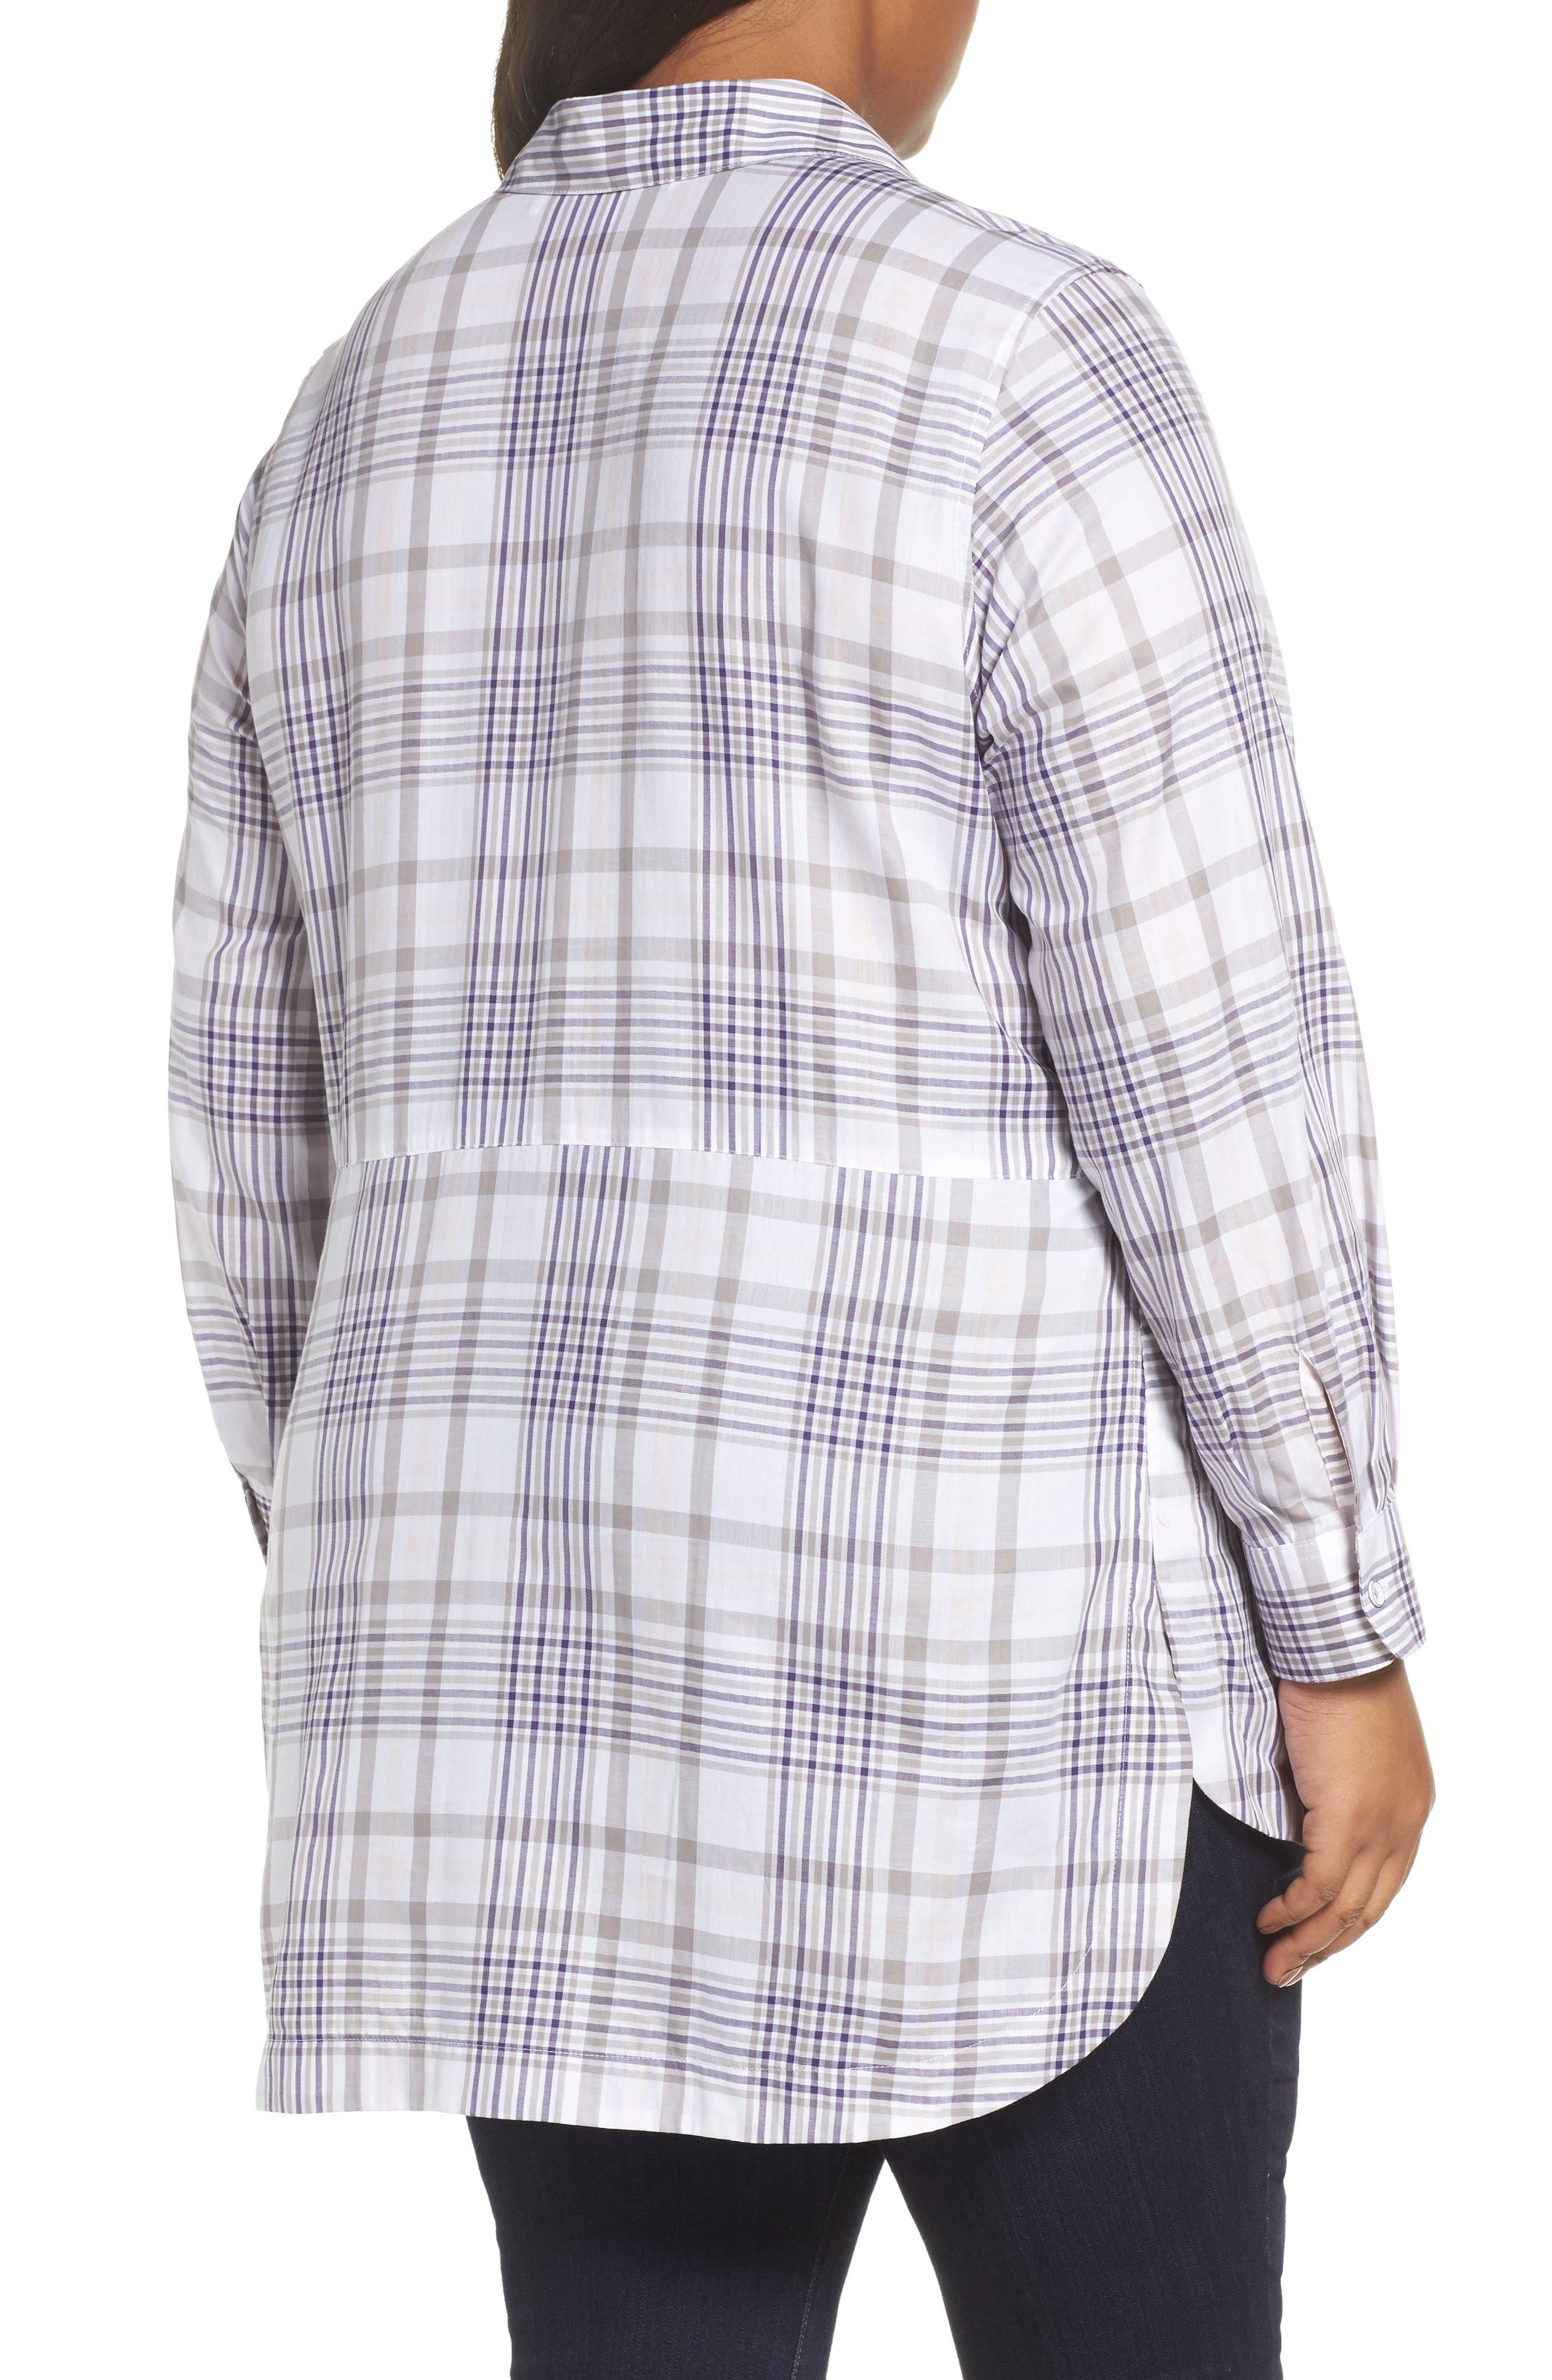 Maddy Winter Plaid Shirt,                             Alternate thumbnail 2, color,                             037